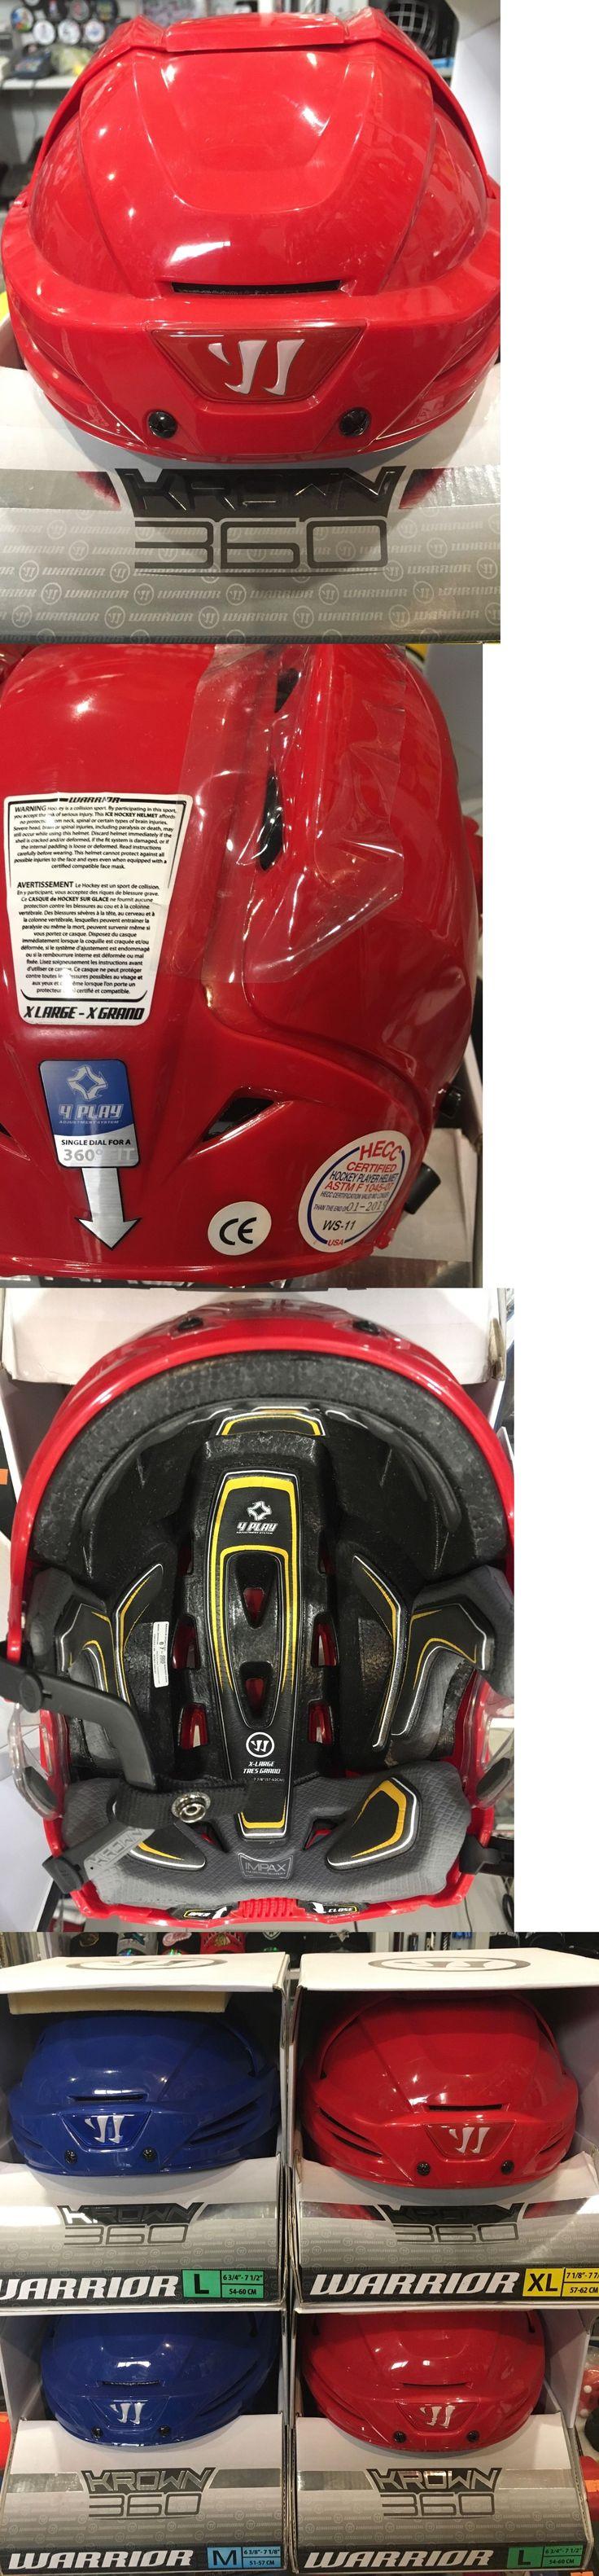 Helmets 20854: Pro Return Warrior Krown 360 Sr. Hockey Helmet -> BUY IT NOW ONLY: $55 on eBay!